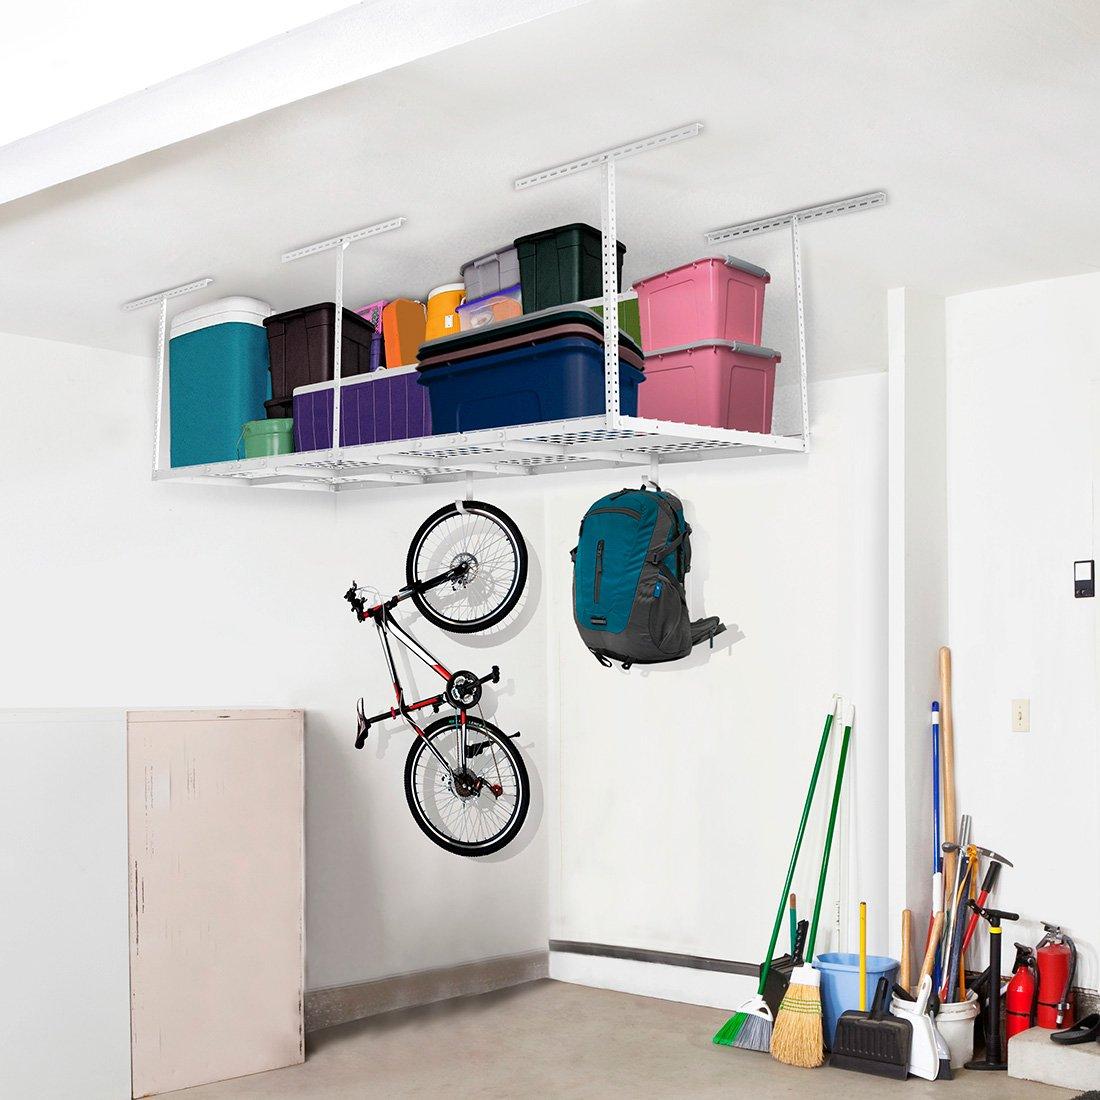 "FLEXIMOUNTS 3x8 Overhead Garage Storage Rack Adjustable Ceiling Storage Rack Heavy Duty, 96"" Length x 36"" Width x 40"" Height, White"